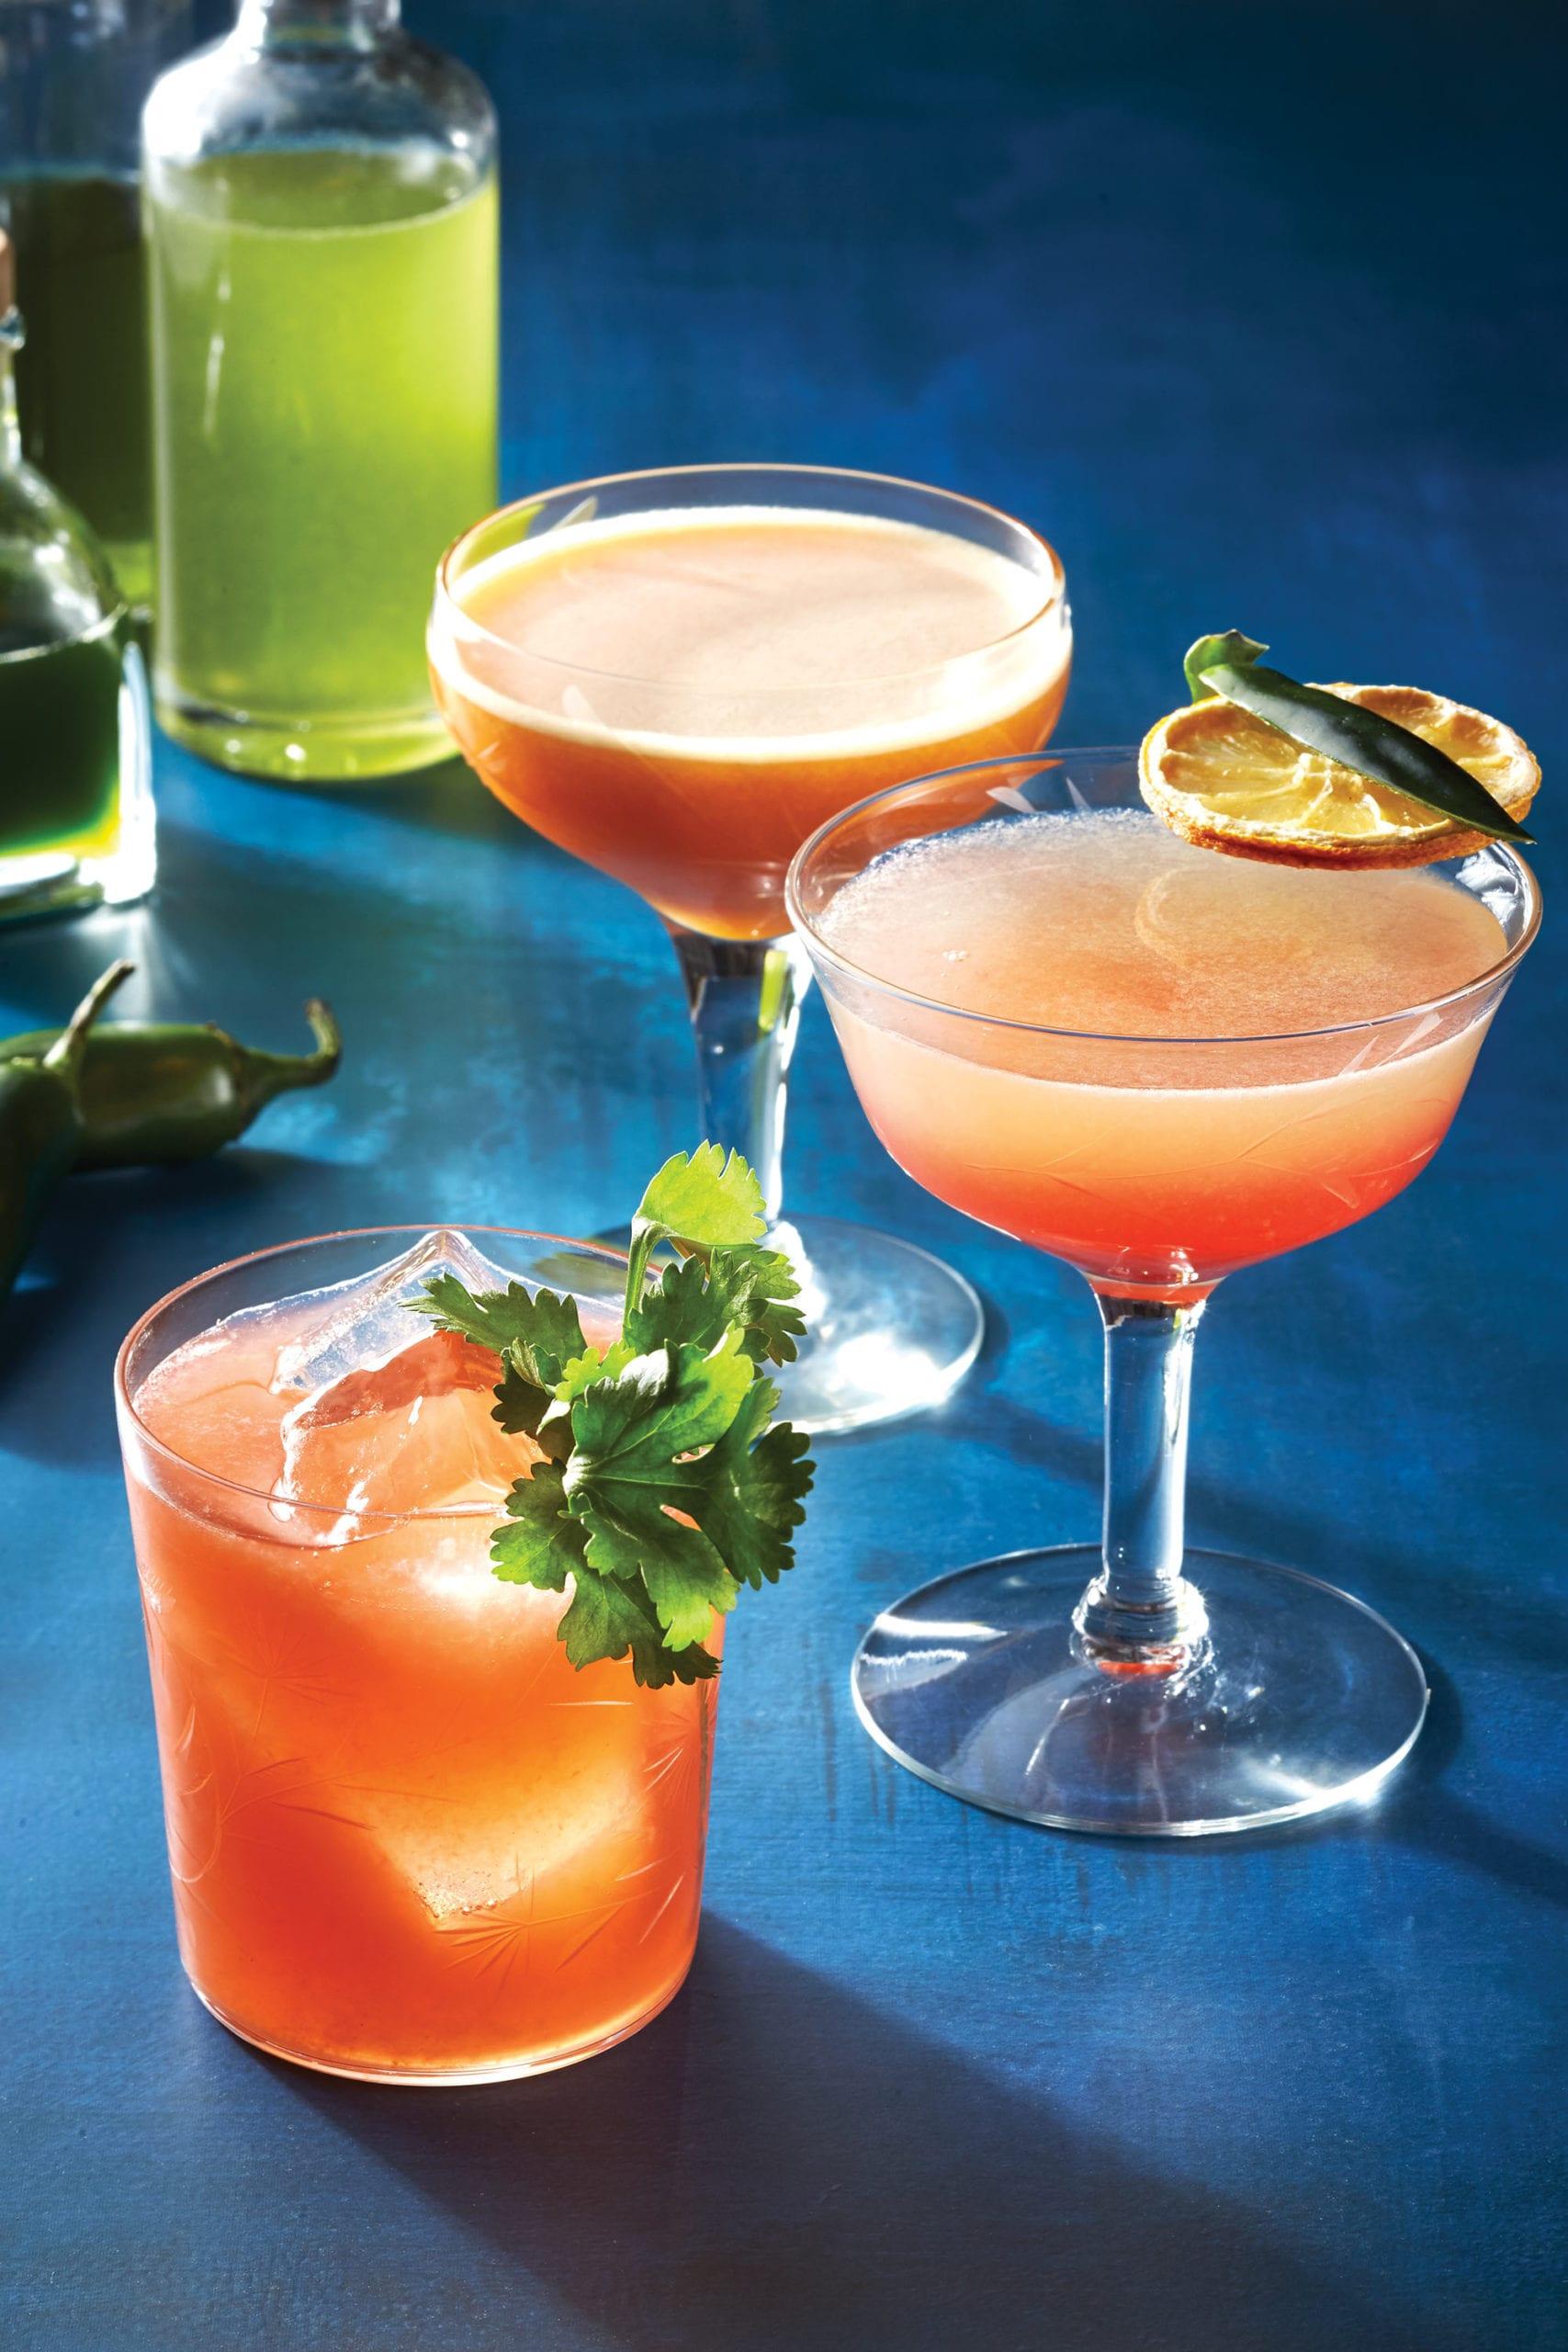 Jalapeño Cocktails